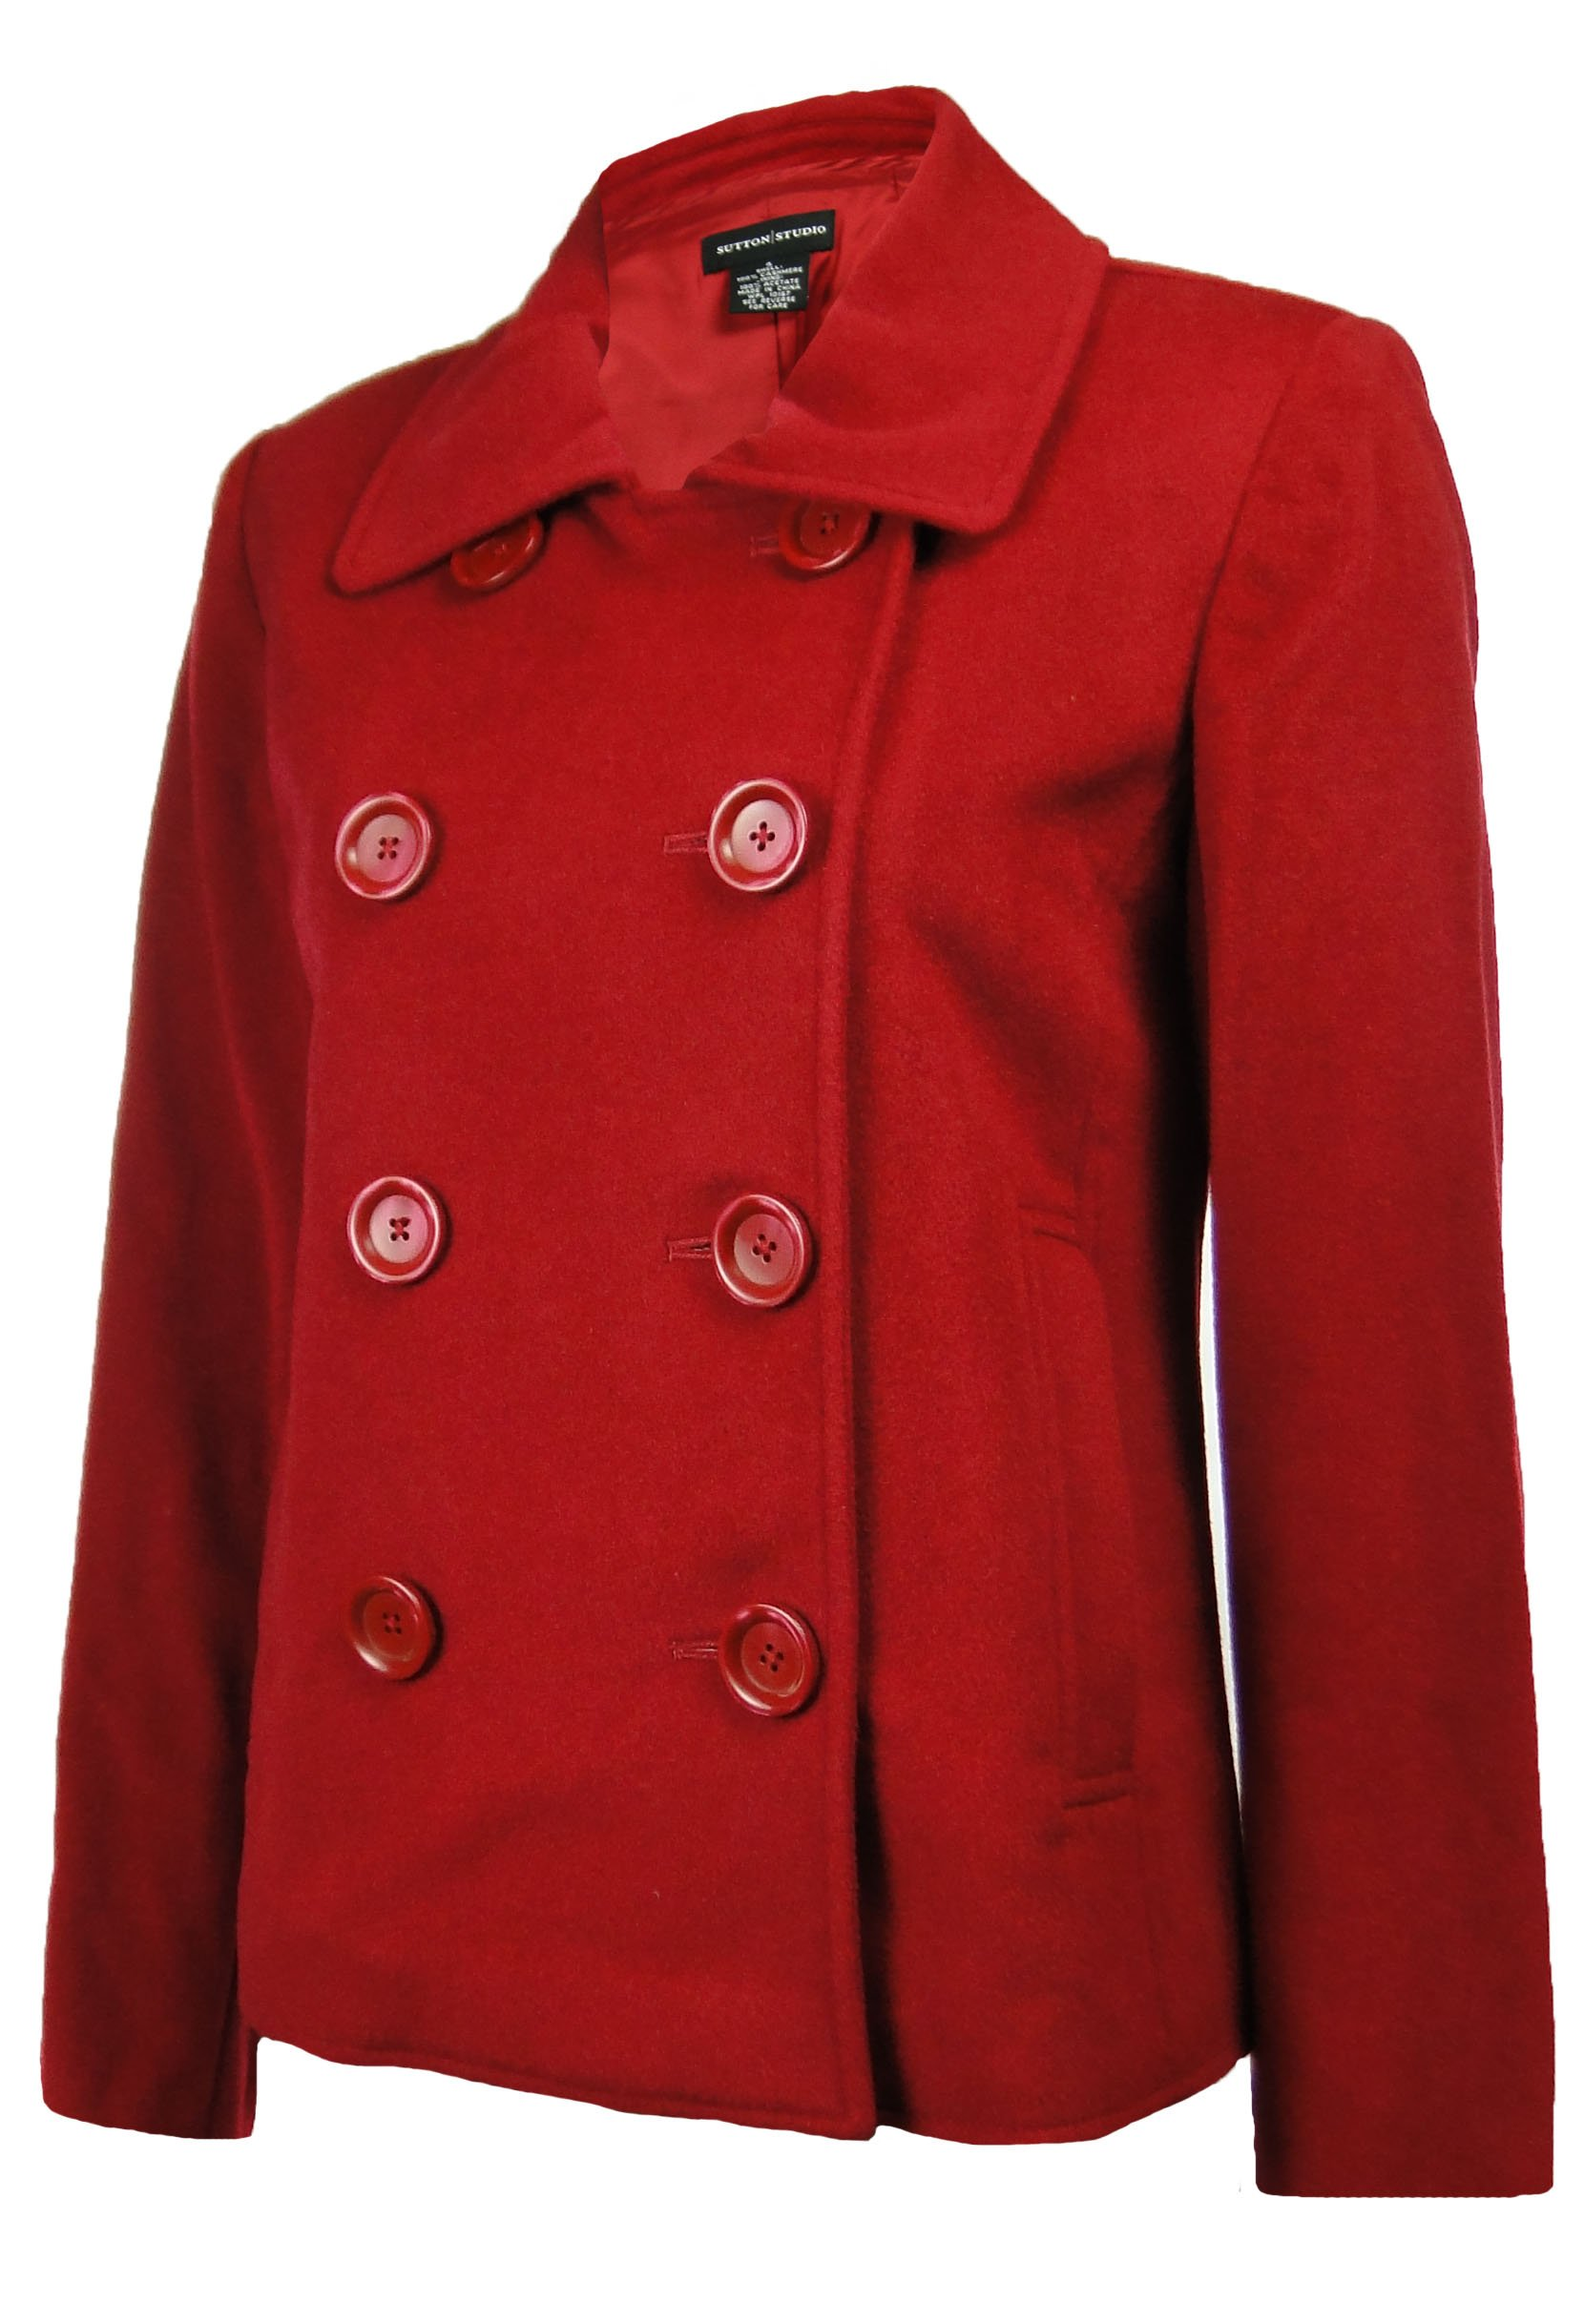 Sutton Studio Womens Cashmere Peacoat Jacket Petite (14 Petite, Claret)